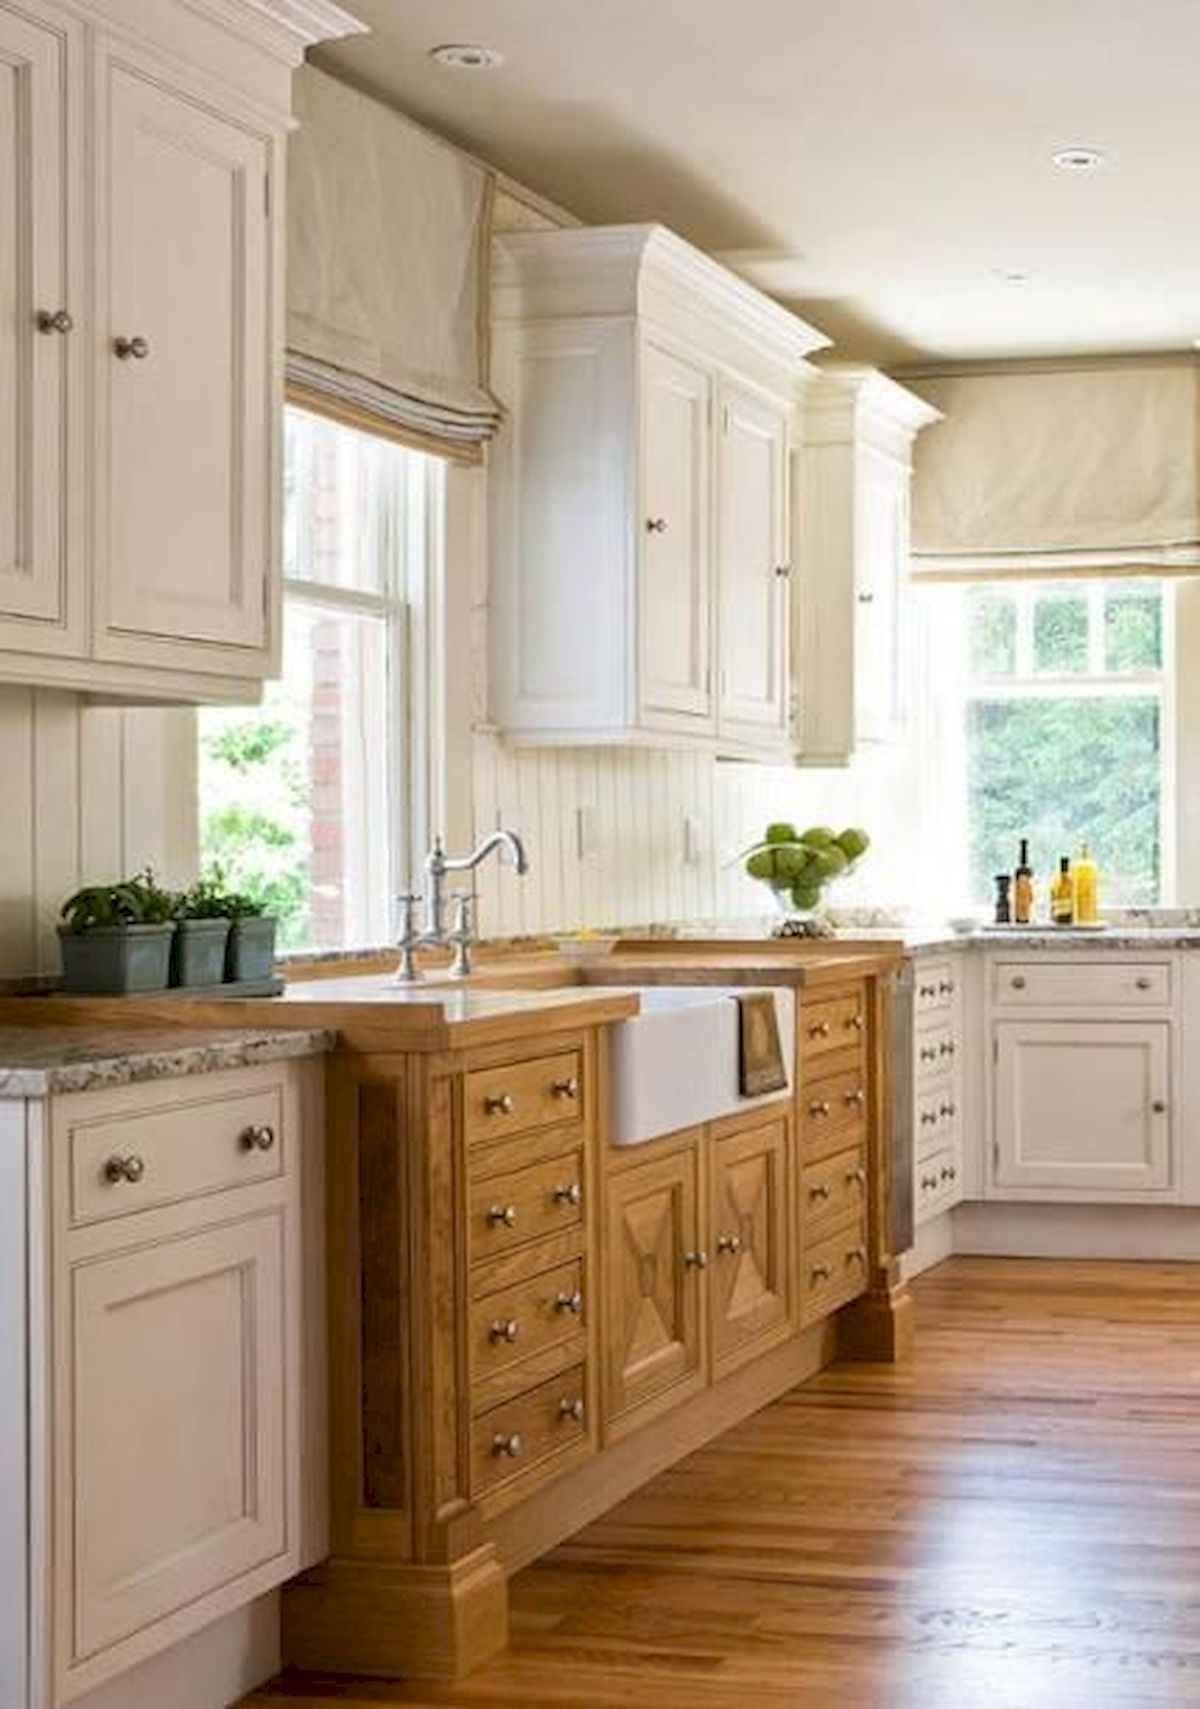 freestanding kitchen moen faucet models cabinets ideas on foter cabinet